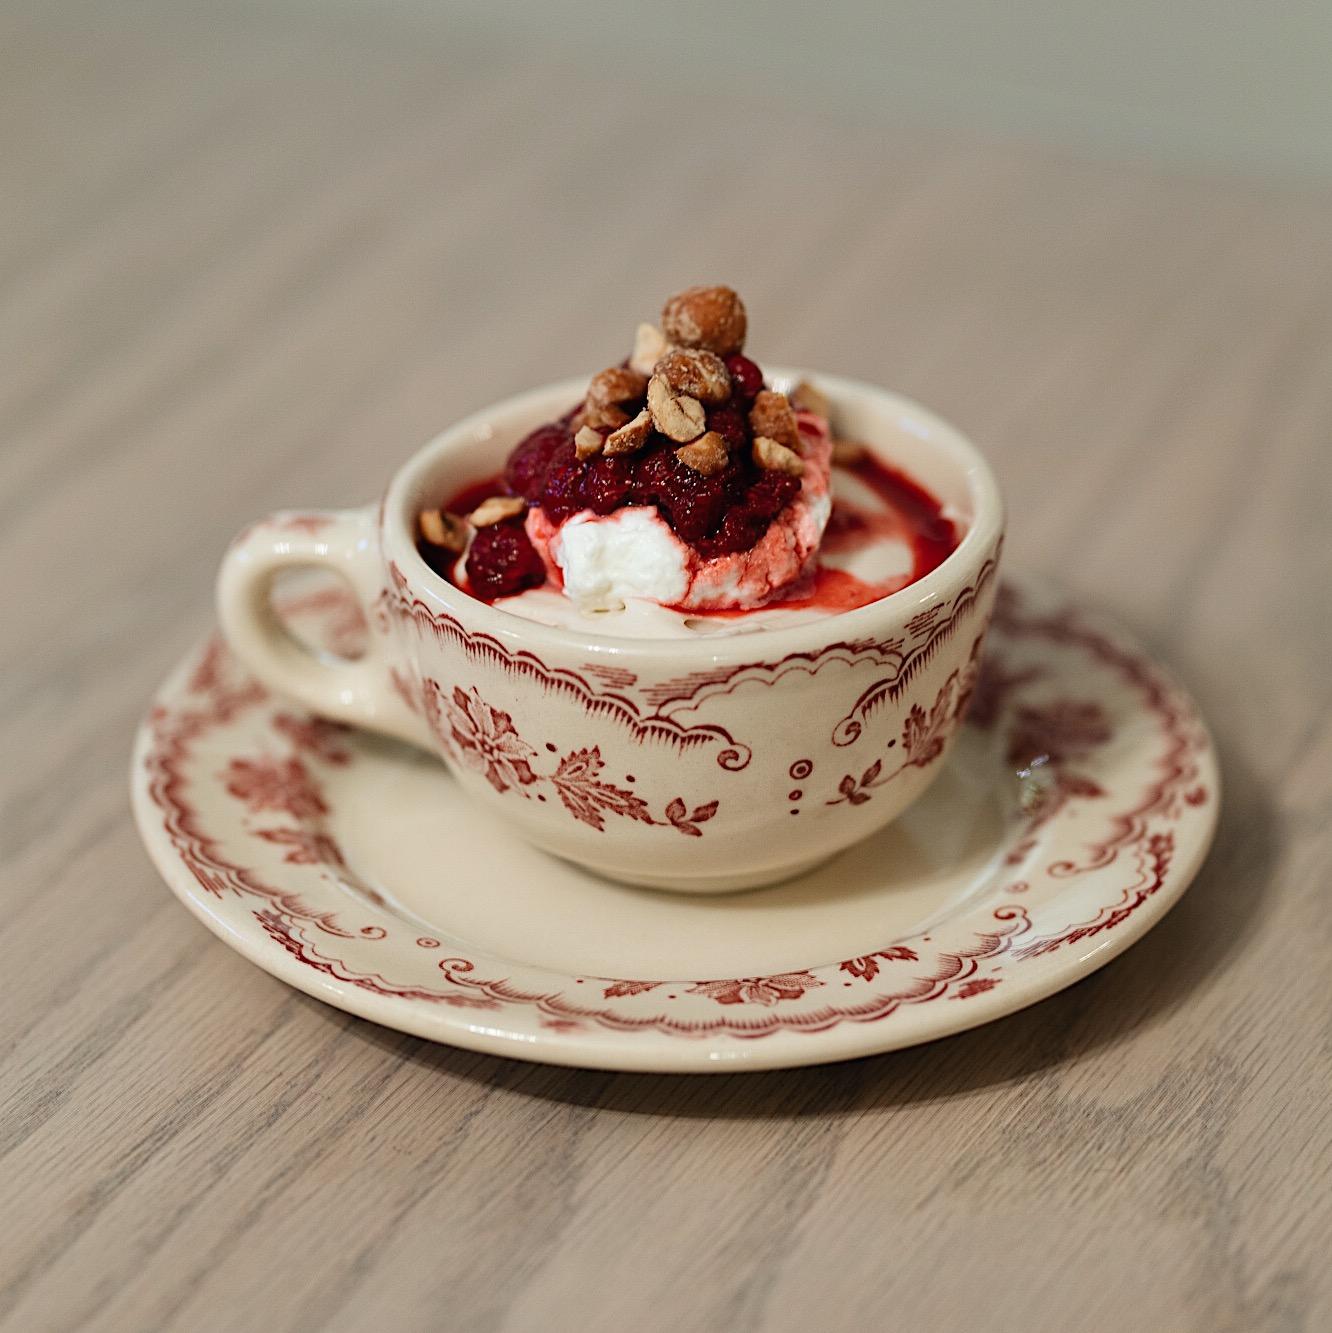 dessert8.JPG